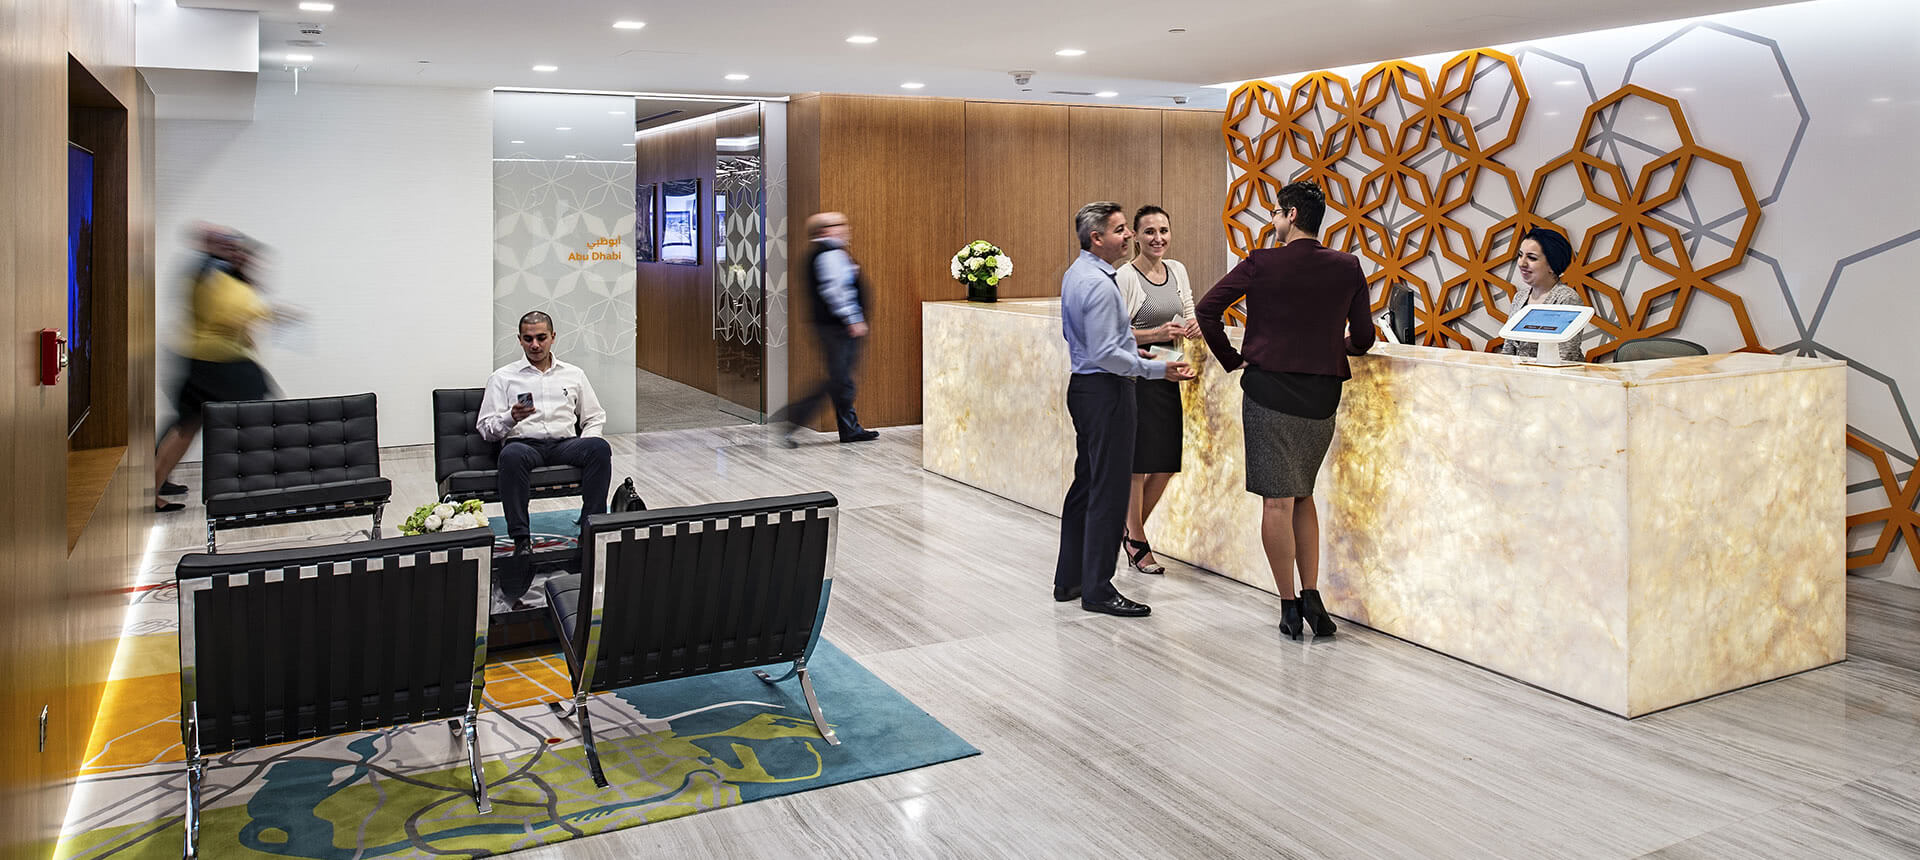 Dubai Office Callisonrtkl